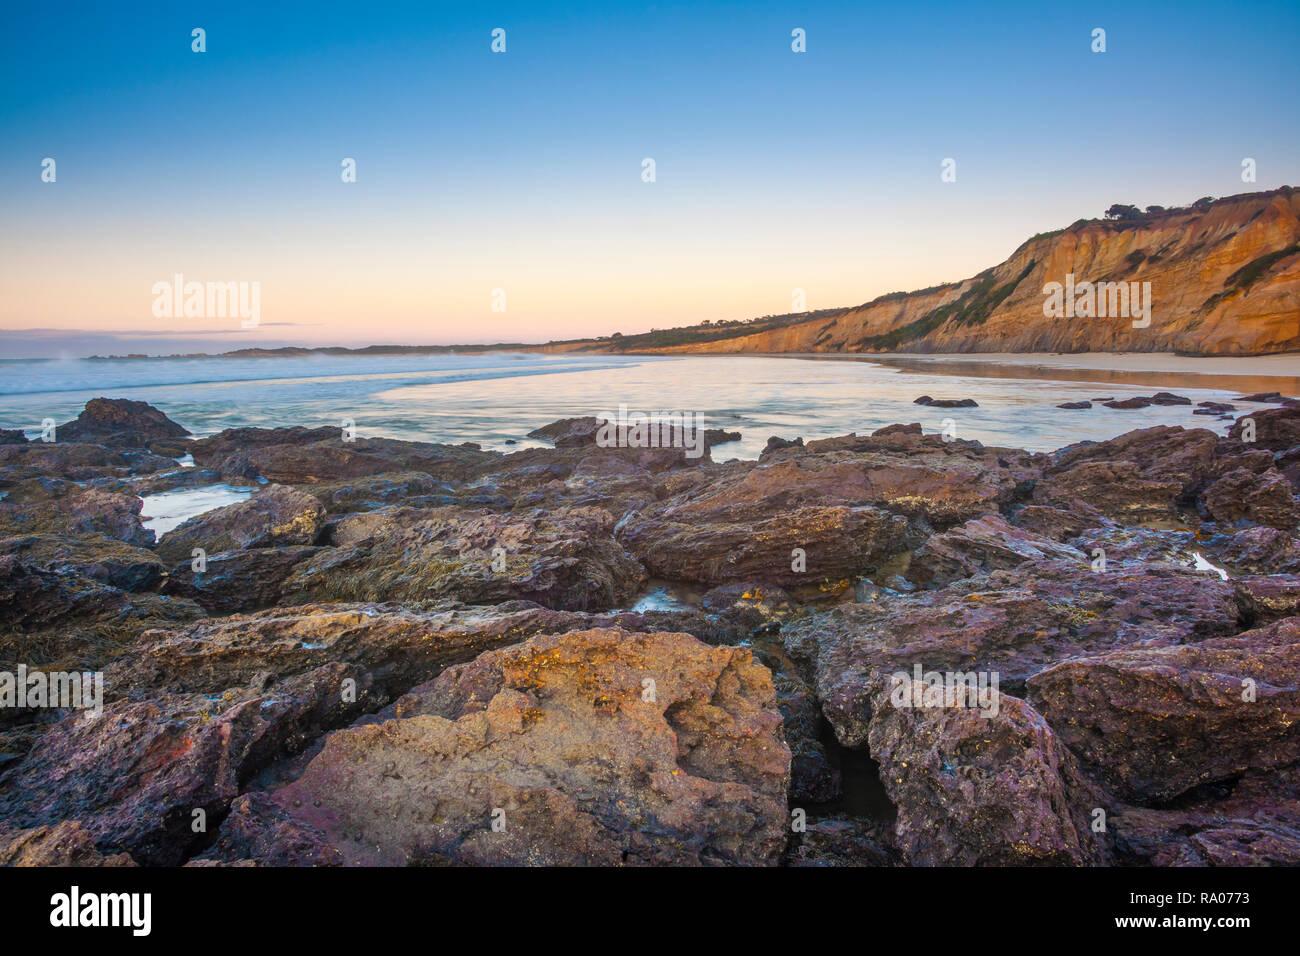 The cliffs of Anglesea Beach, Anglesea, Surf Coast Shire, Great Ocean Road, Victoria, Australia at dawn. - Stock Image